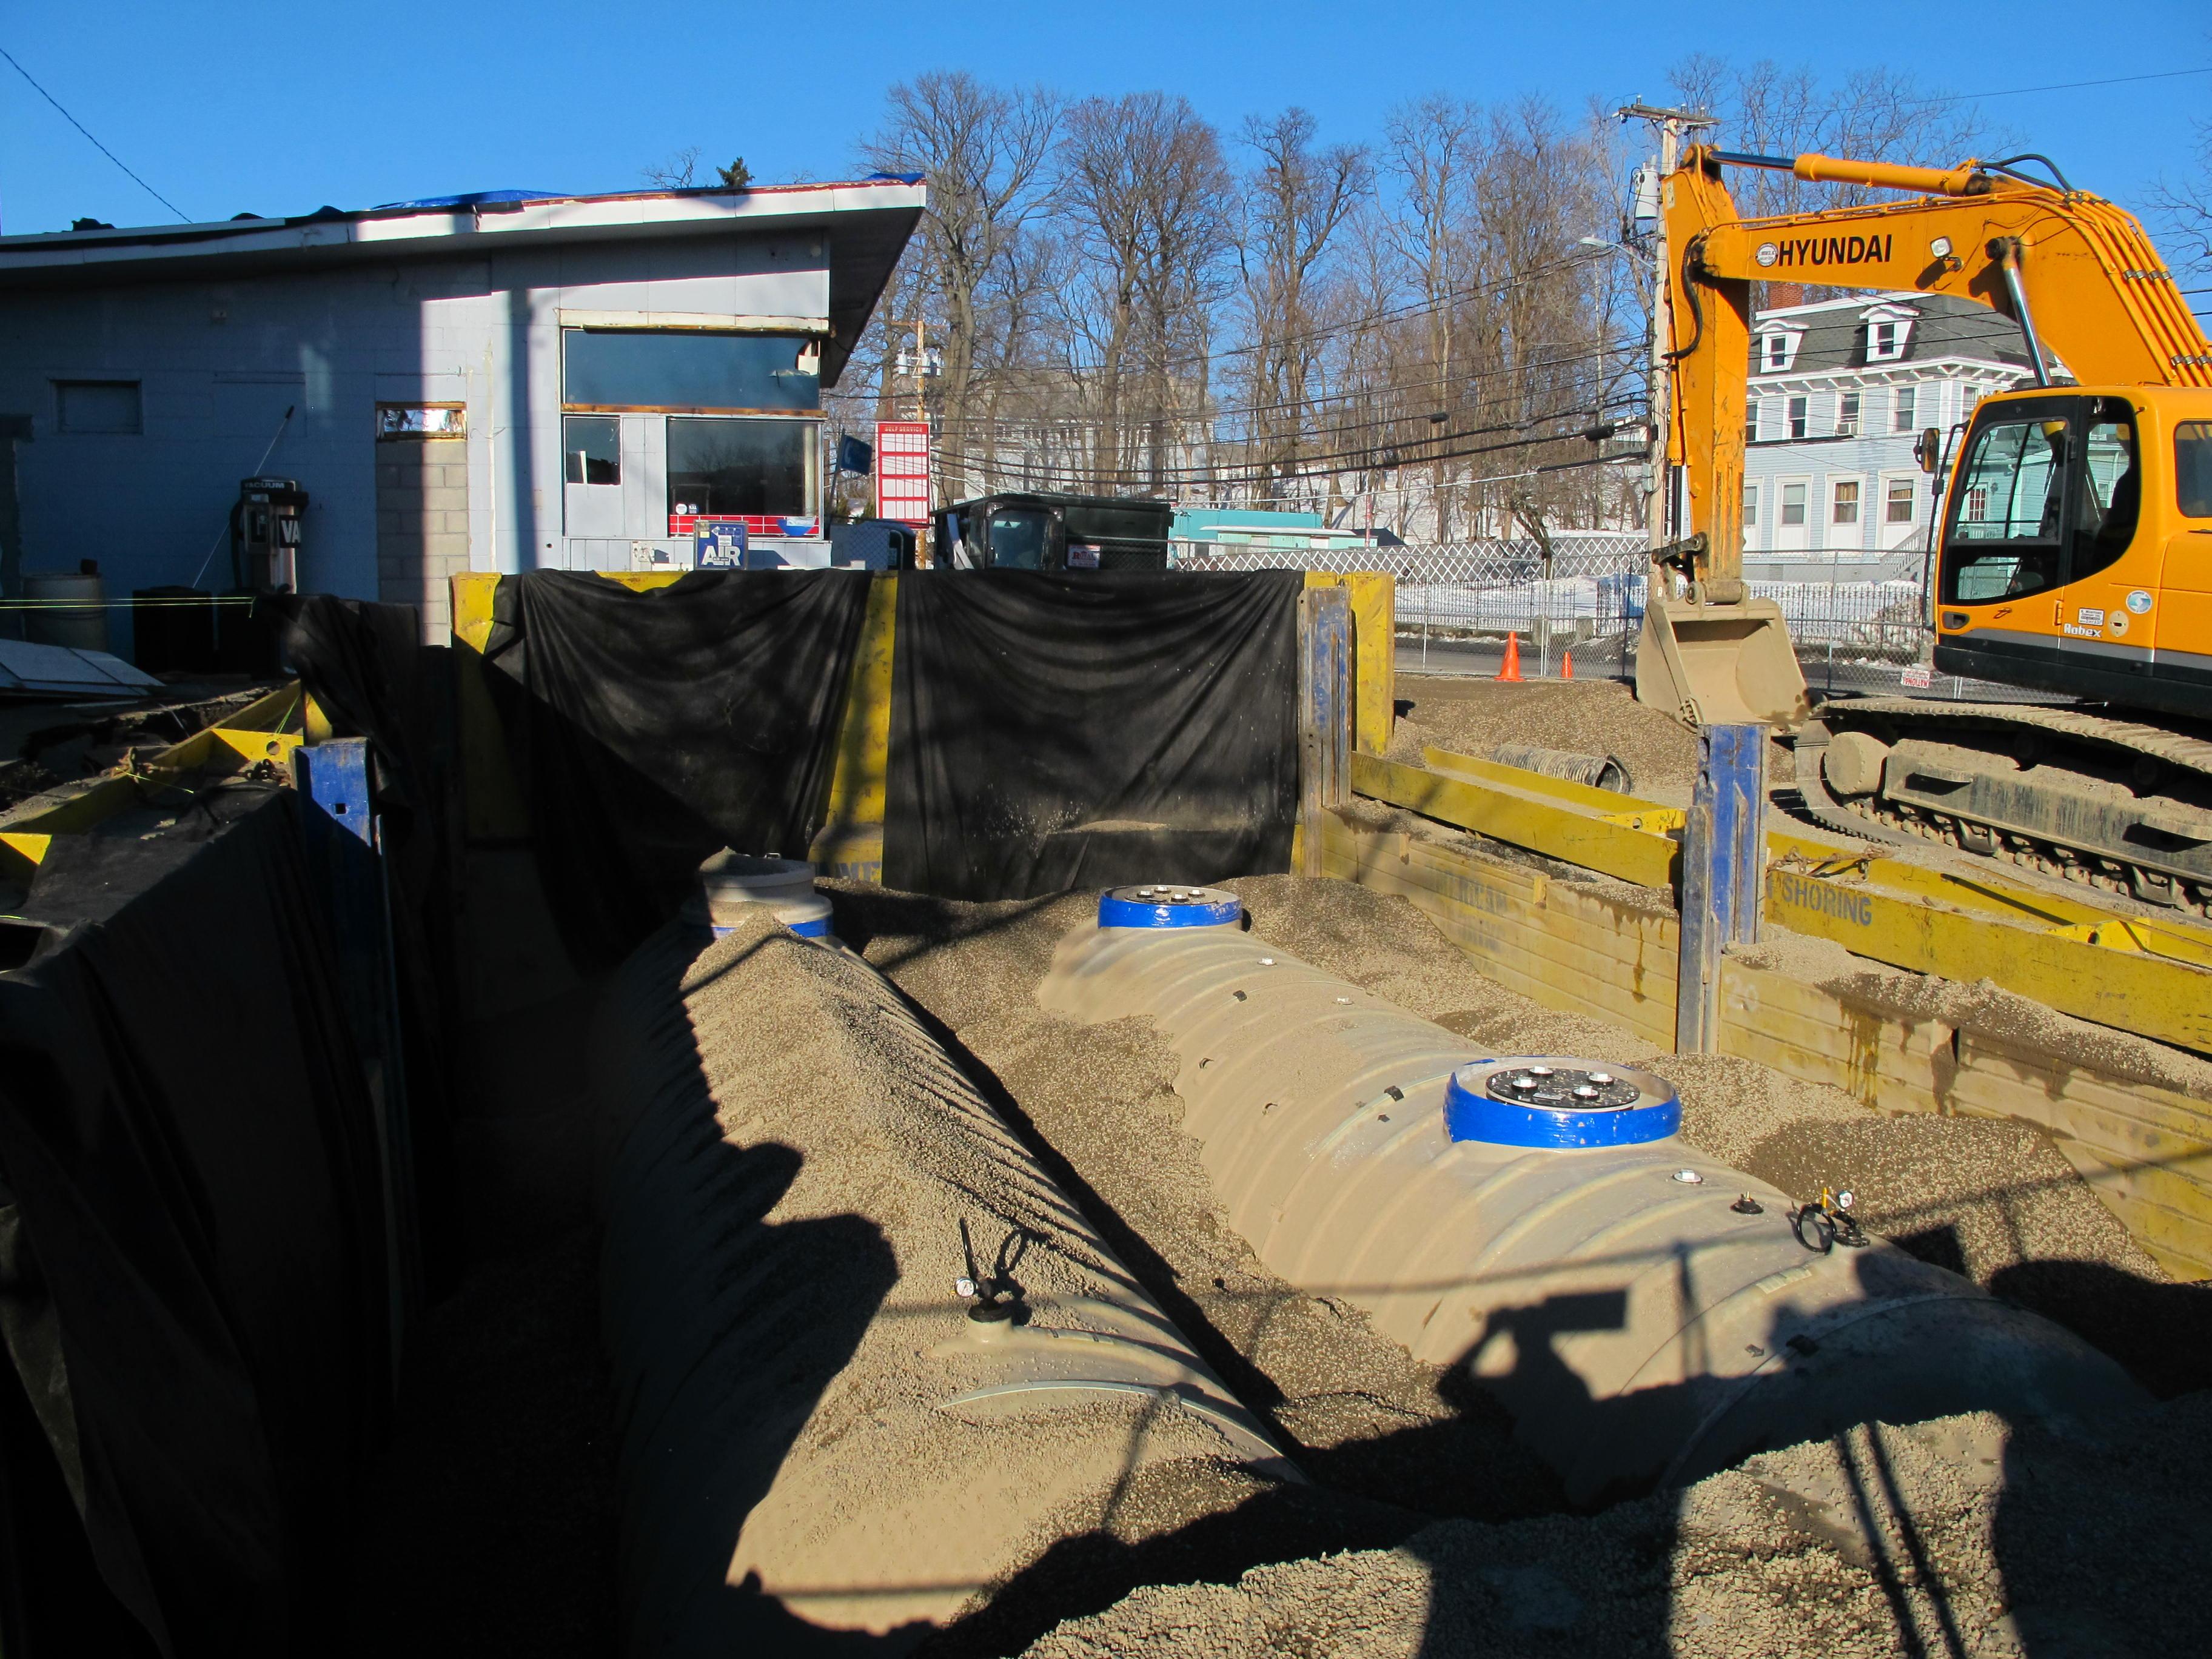 Gas Station Set to Expand Despite Nonconforming Use